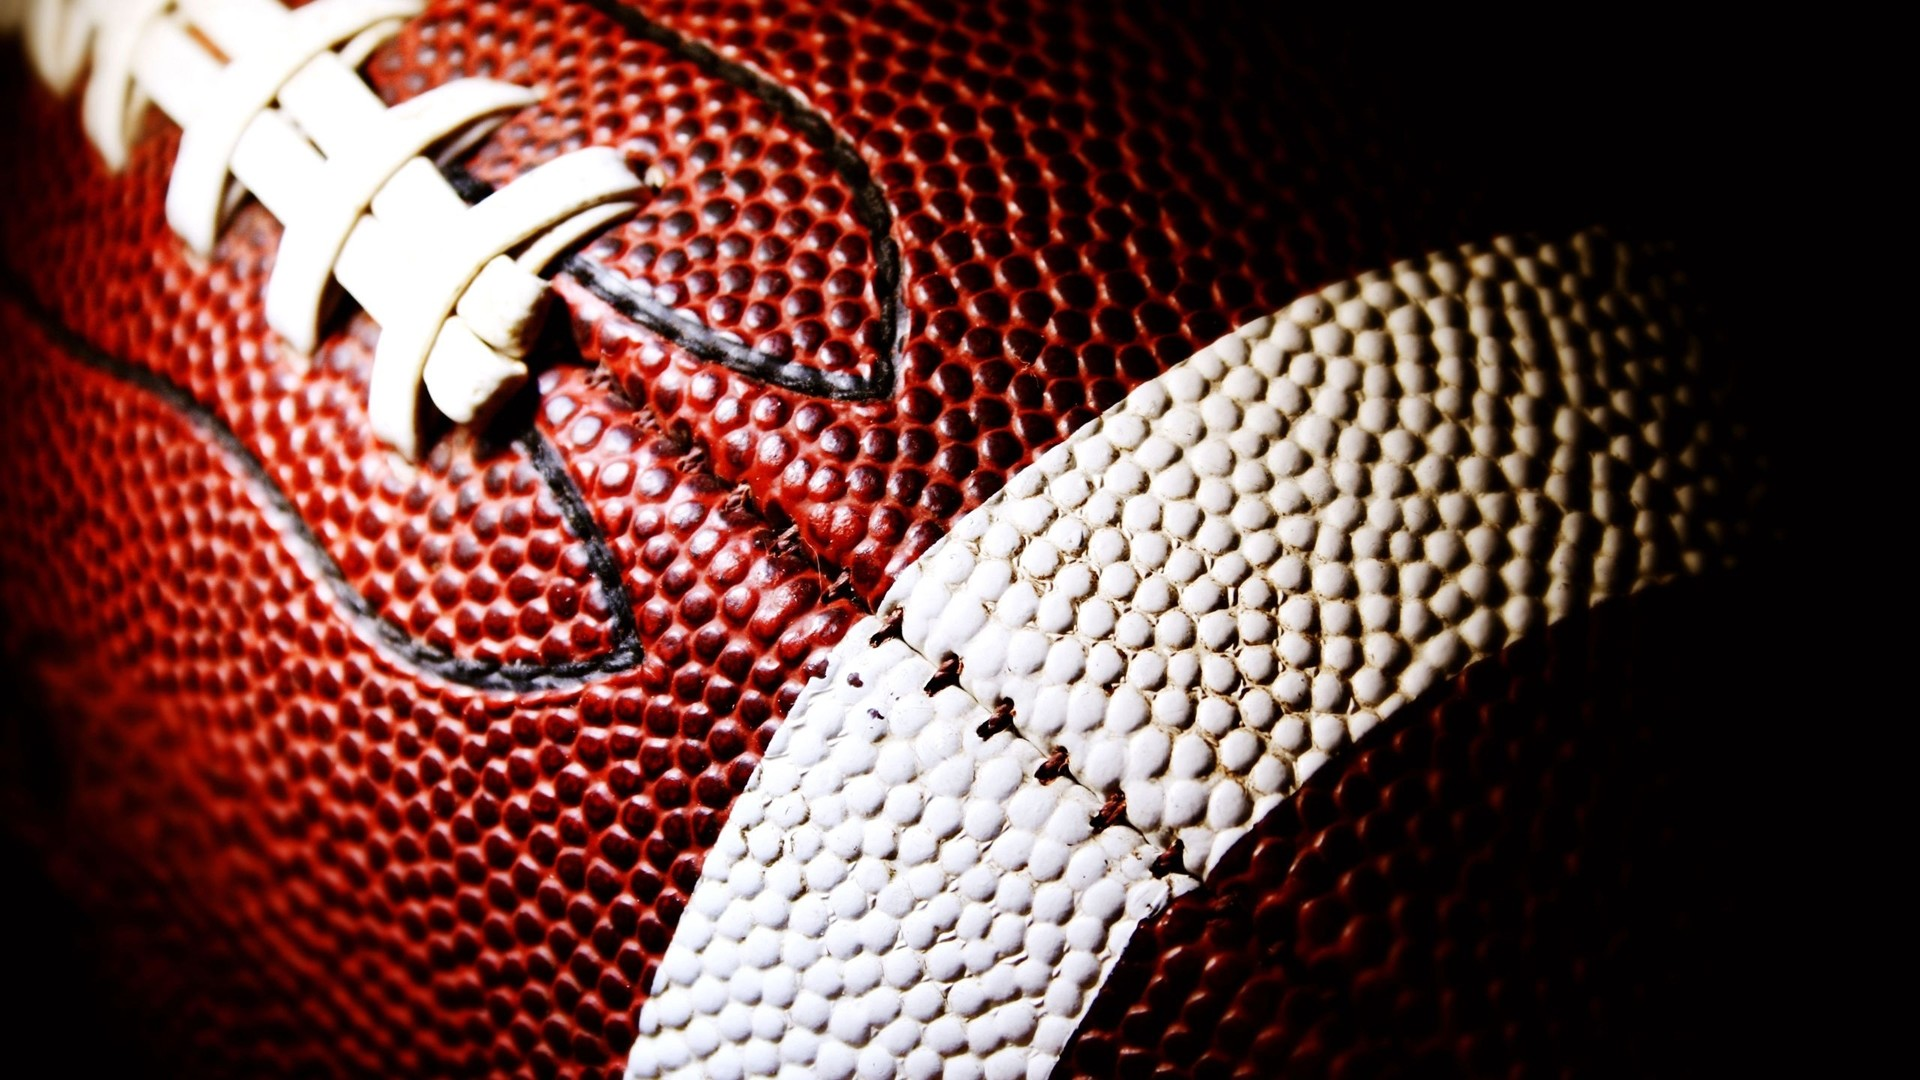 Cool NFL Football Wallpapers Wallpaper 1600×1200 American Football Wallpaper  (55 Wallpapers)  